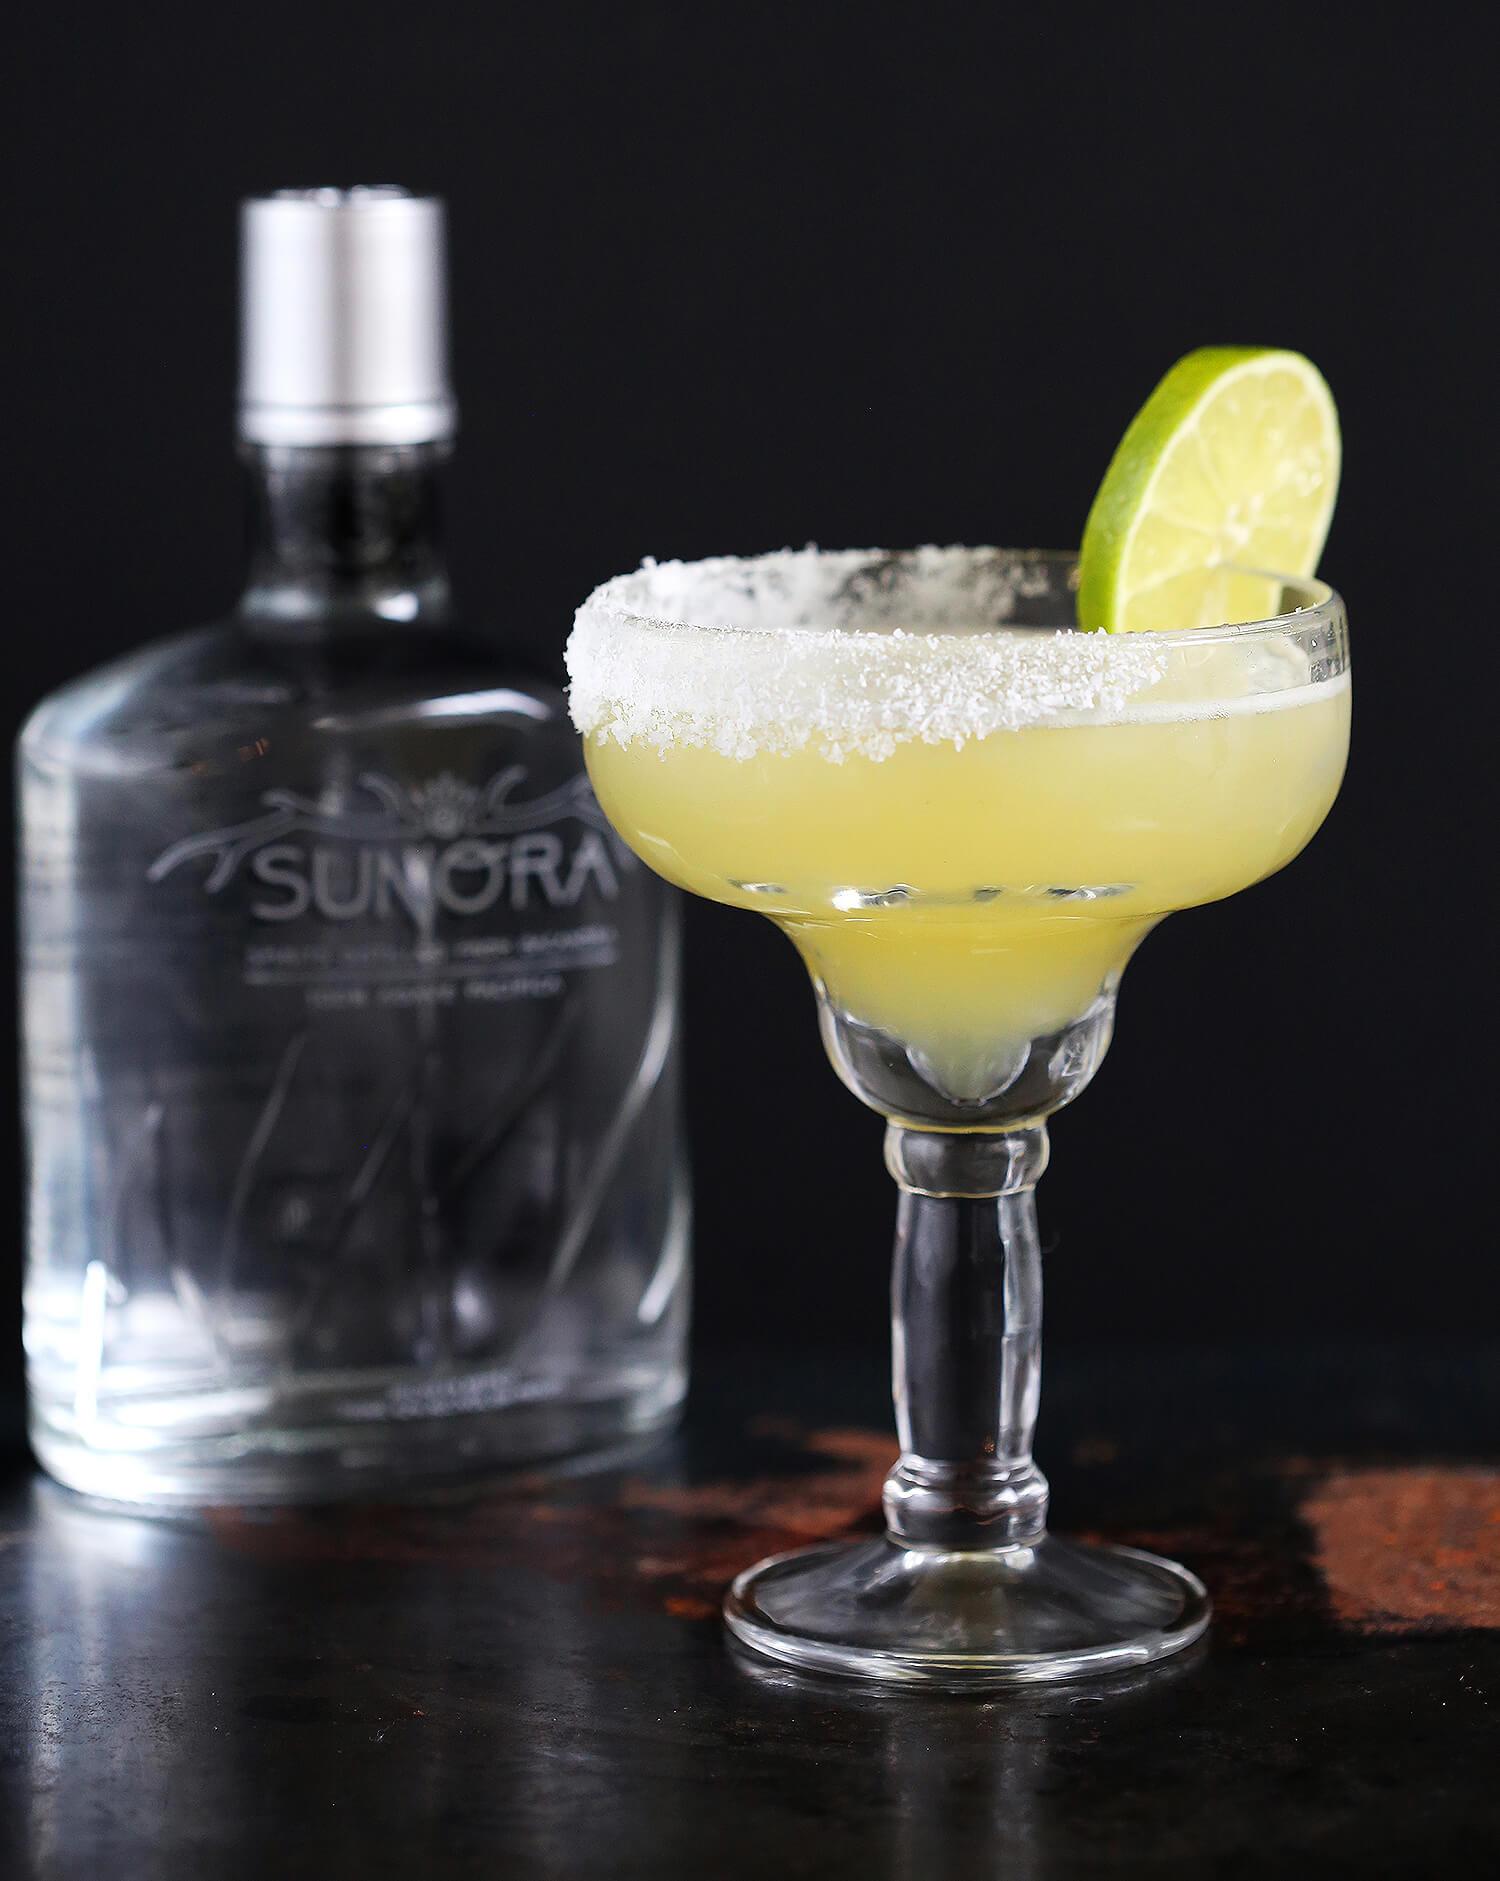 Bacarita™ Made with Sunora Bacanora Blanco